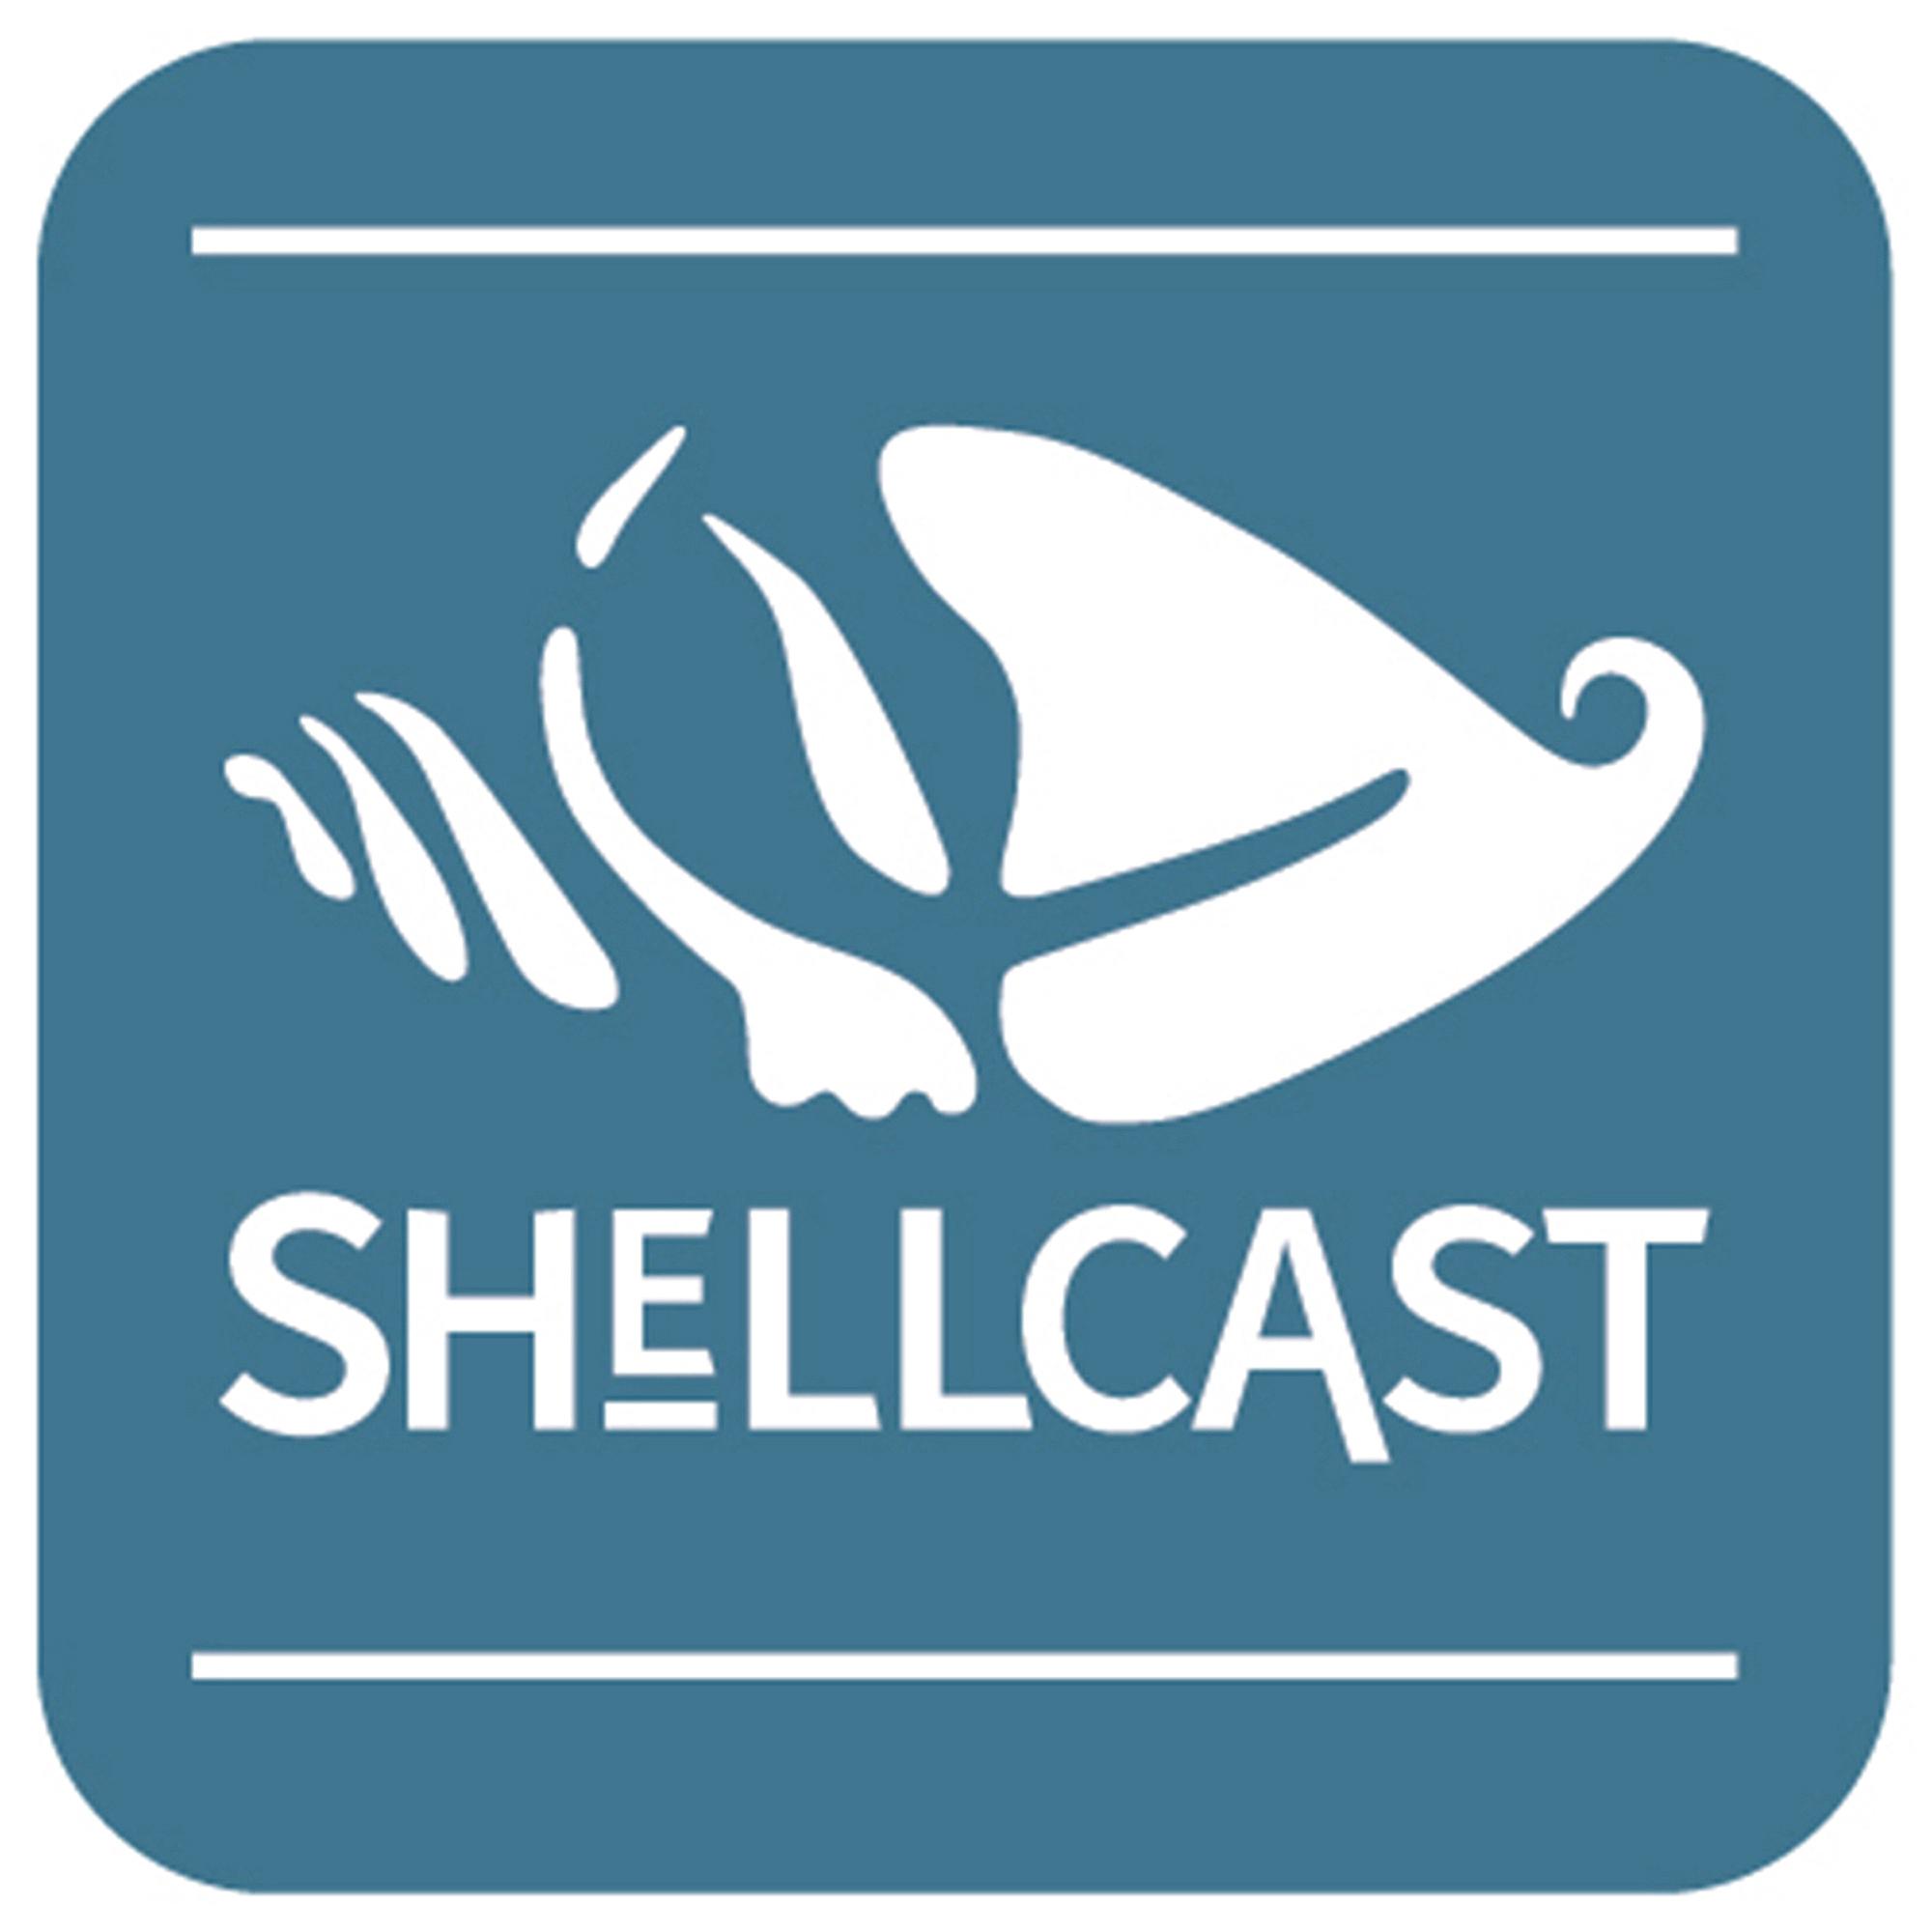 Listen to Shellcast